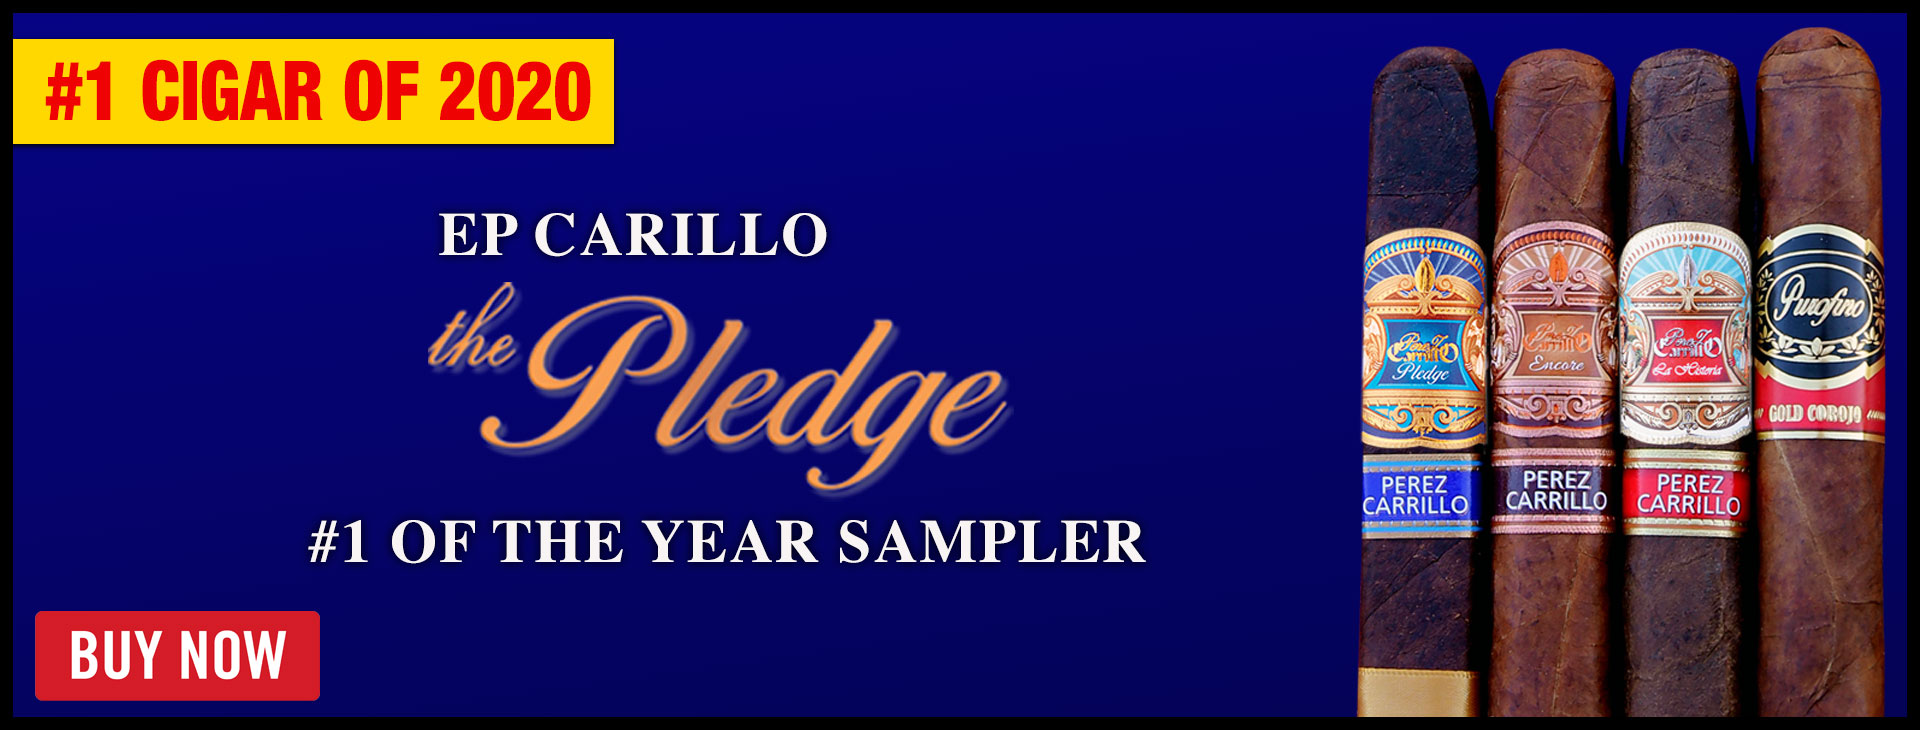 ep-carillo-pledge-2021-banner.jpg